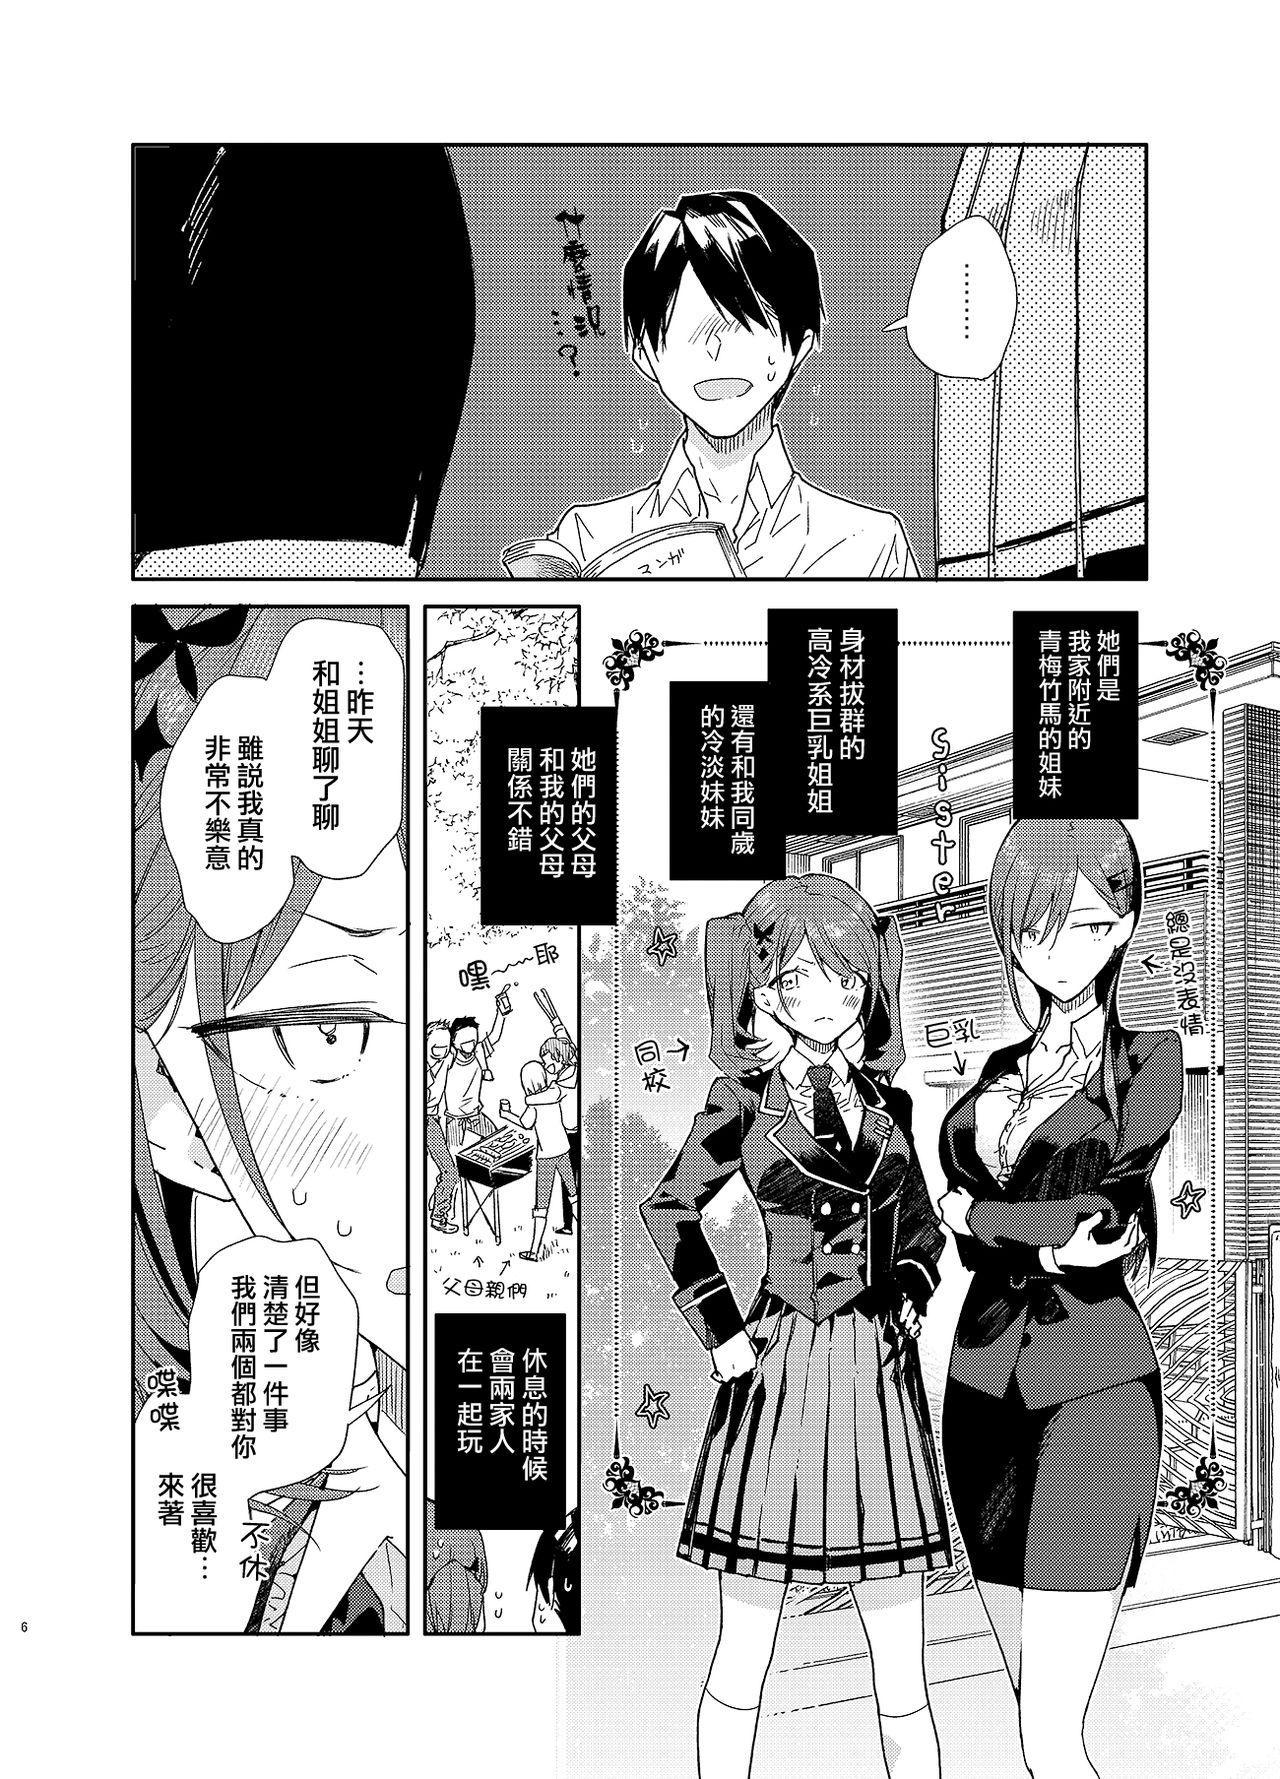 Kinjo no Tsuntsun Imouto to Muhyoujou Ane ni Semarare Ecchi   被附近的冷淡妹妹和無表情的姐姐強行做愛 30